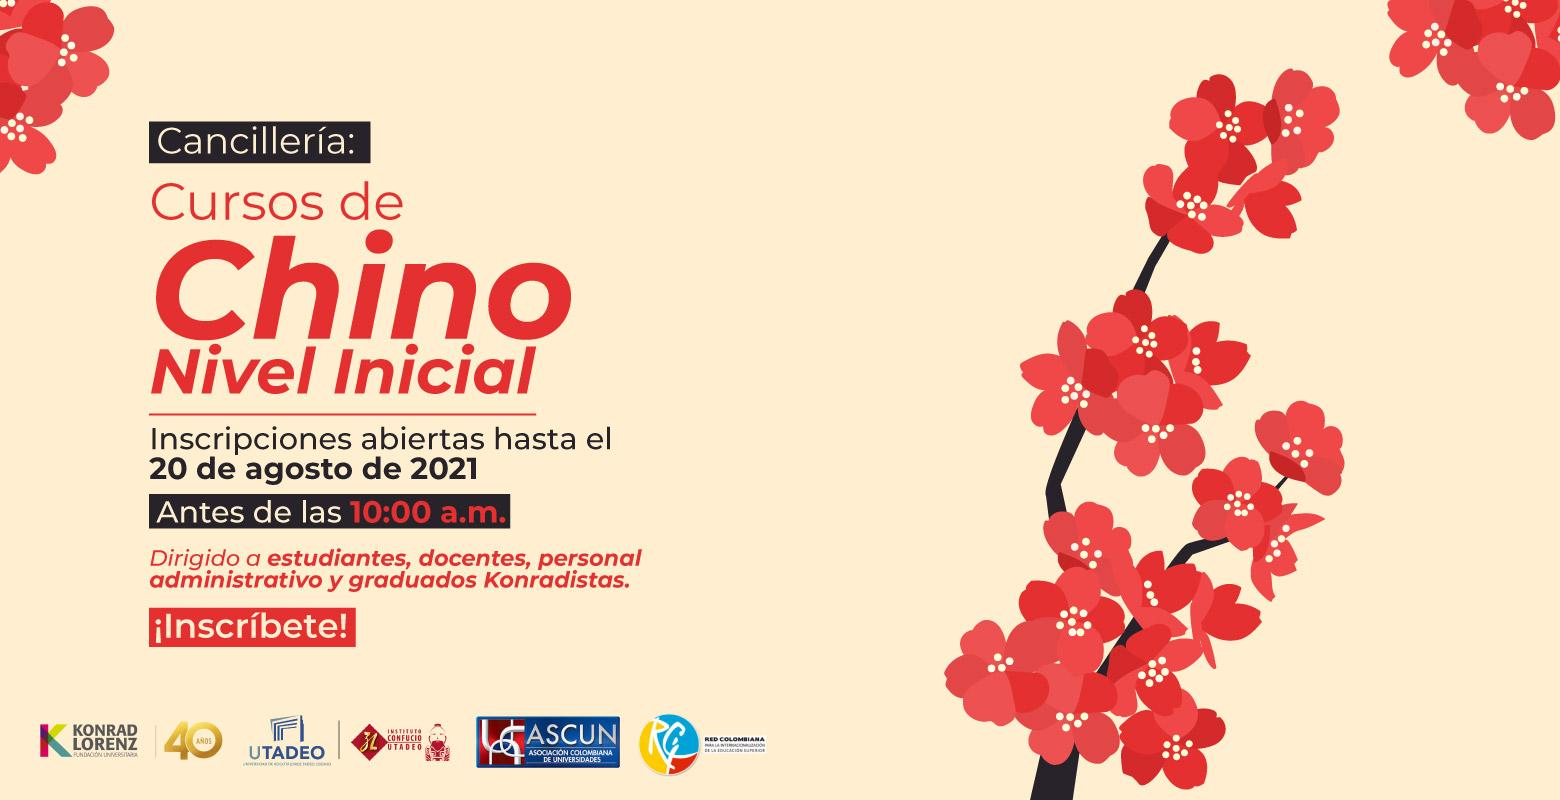 Cancillería: Cursos de Chino Nivel Inicial